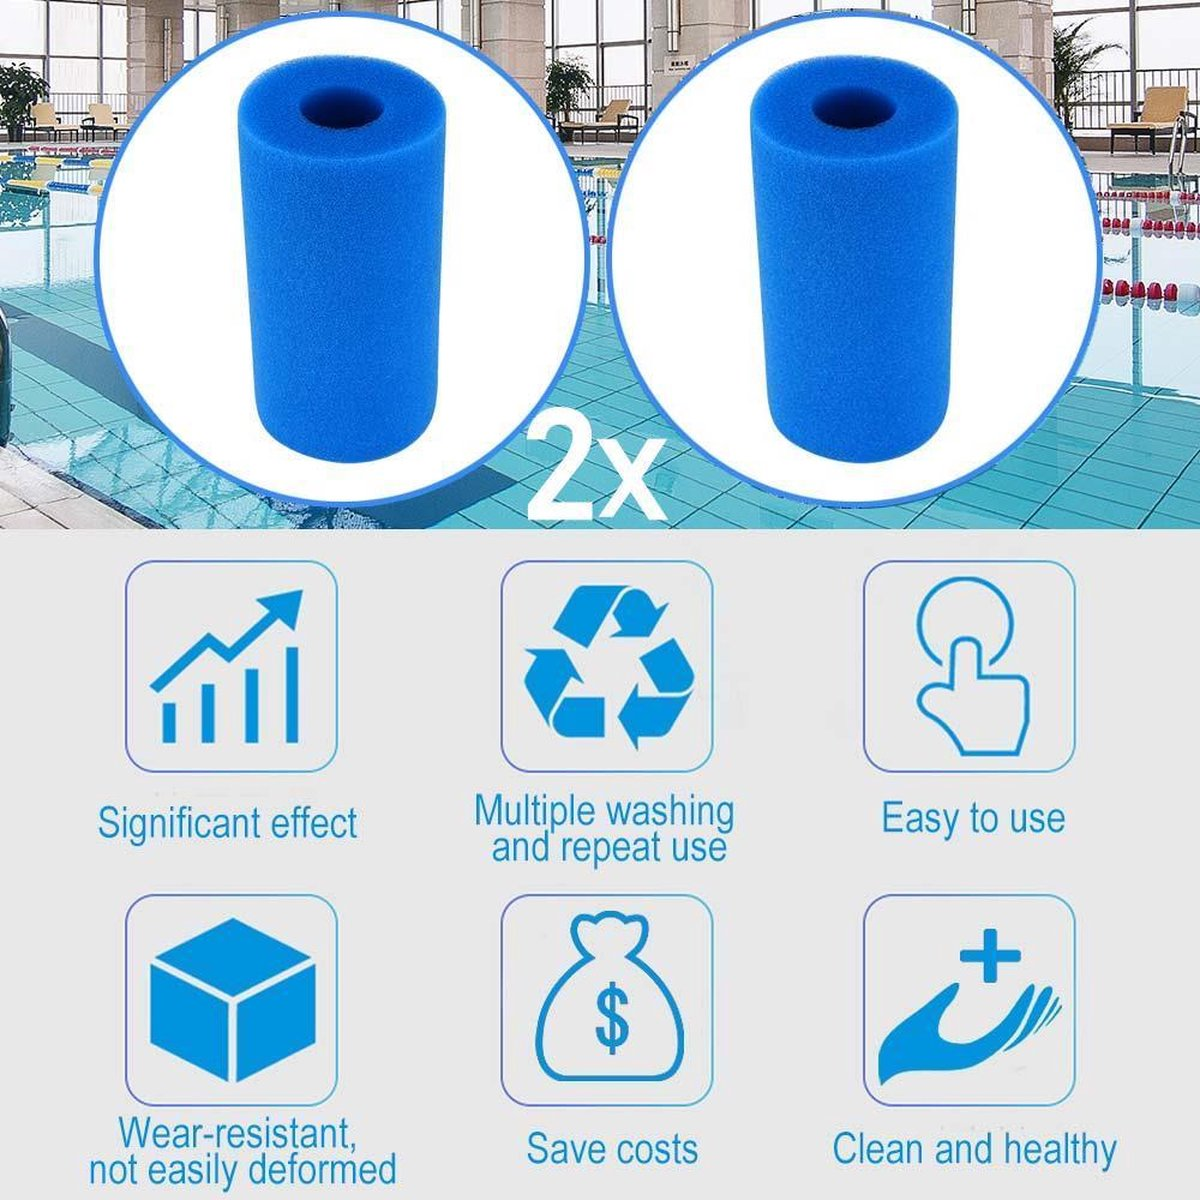 2x Intex Filter Type A Cartridge -Wasbaar & Herbruikbaar - Zwembad onderhoud - Intex A